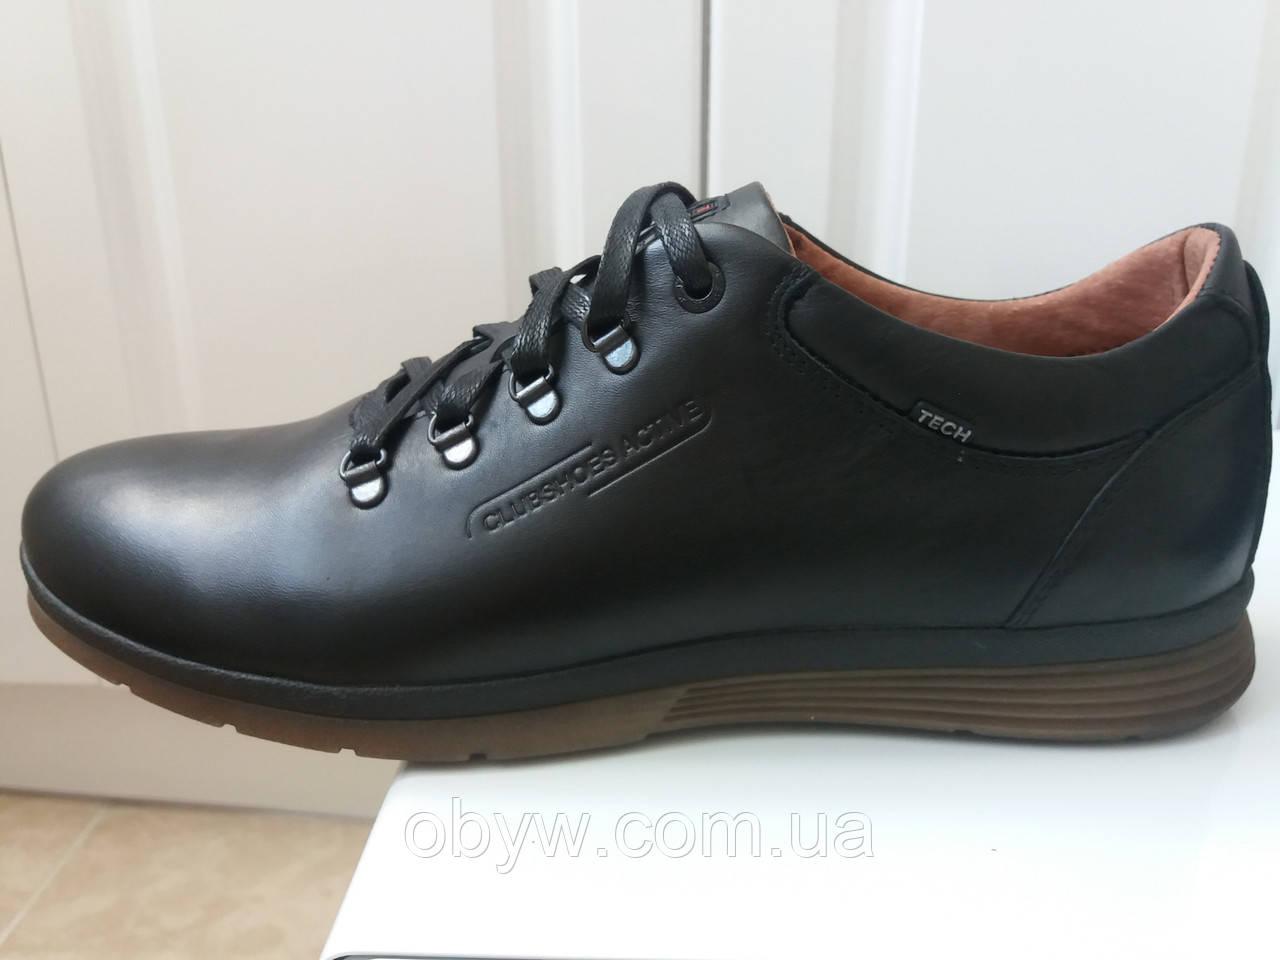 a8c3521ef Обувь мужская осенняя: продажа, цена в Днепре. туфли мужские от ...